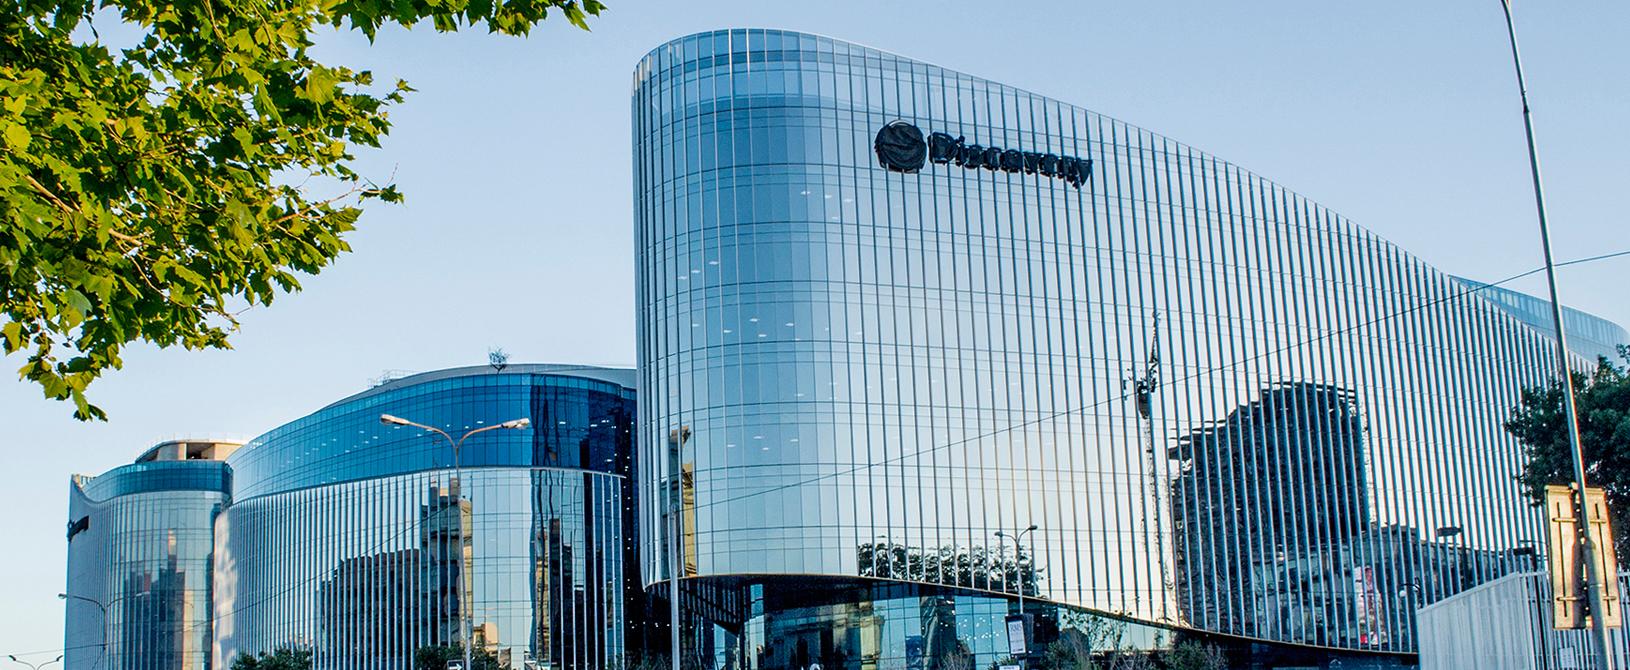 office facades. Discovery Global Head Office Facades